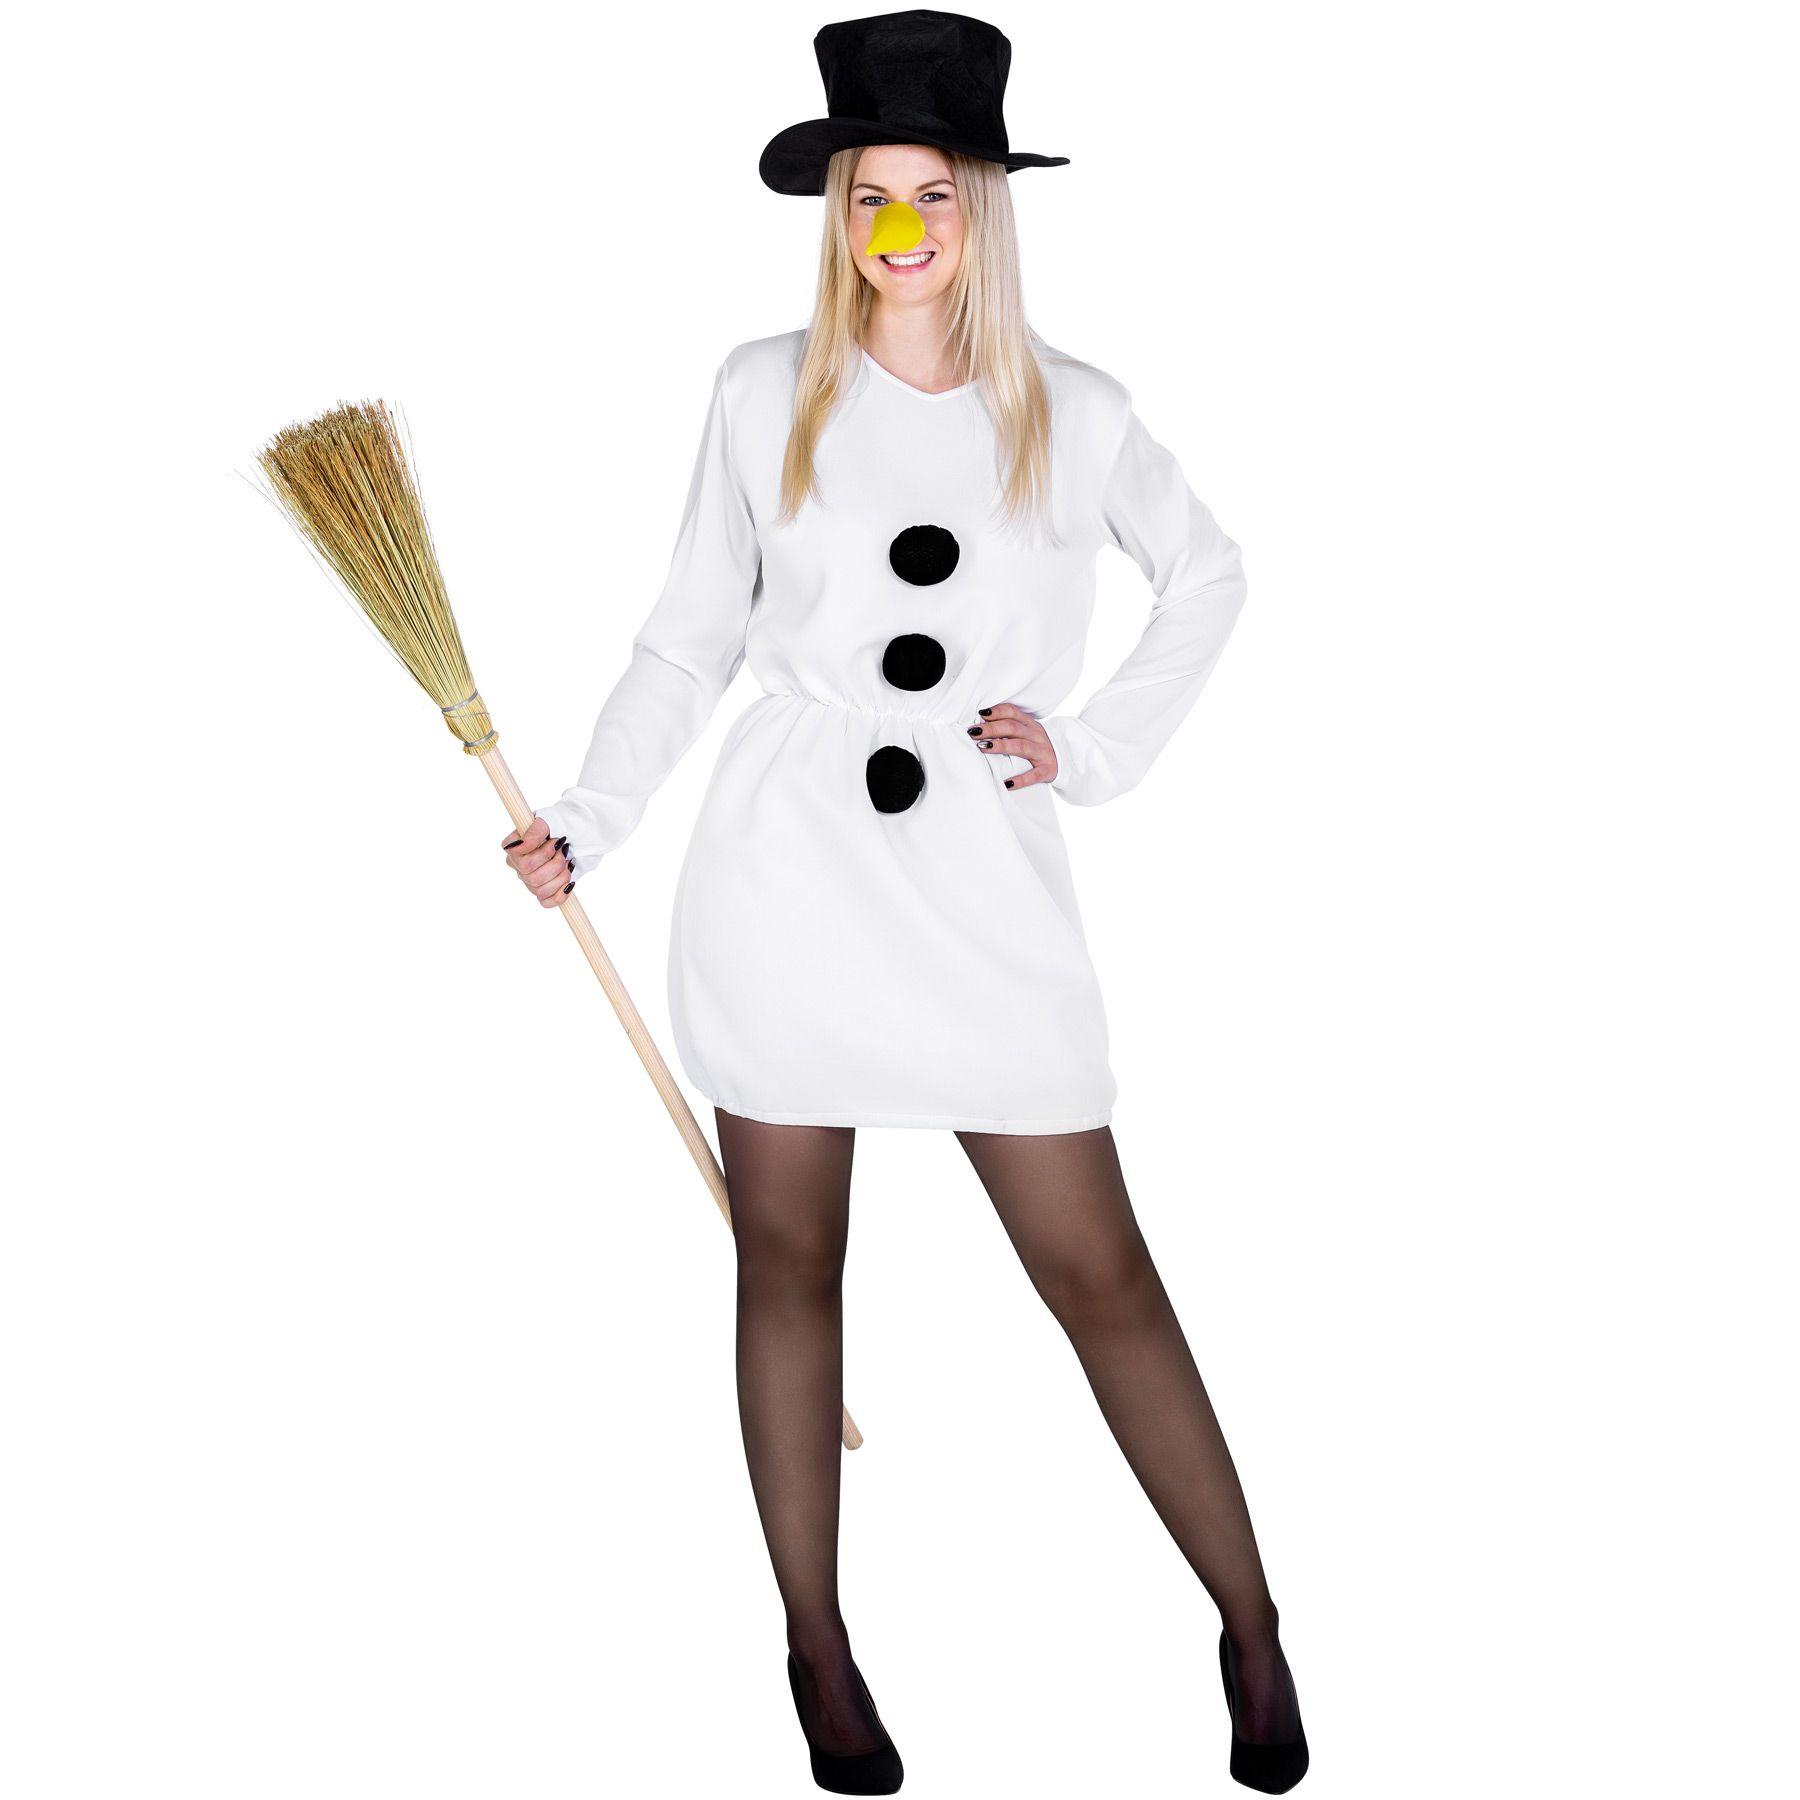 Costume Donna di neve pupazzo di neve festa di natale incl cilindro carnevale n